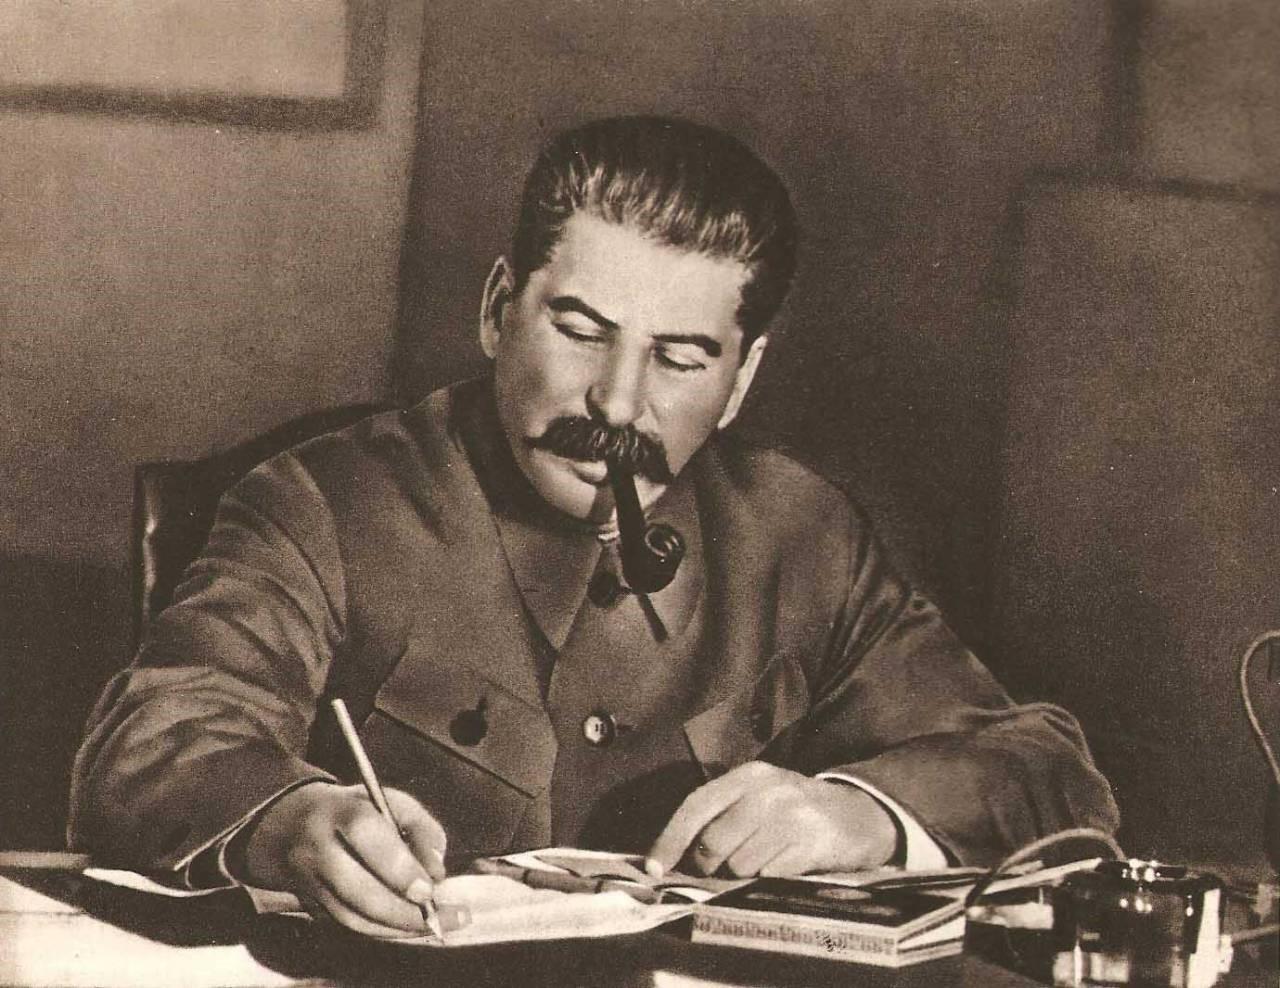 Иосиф Виссарионович пишет и курит трубку